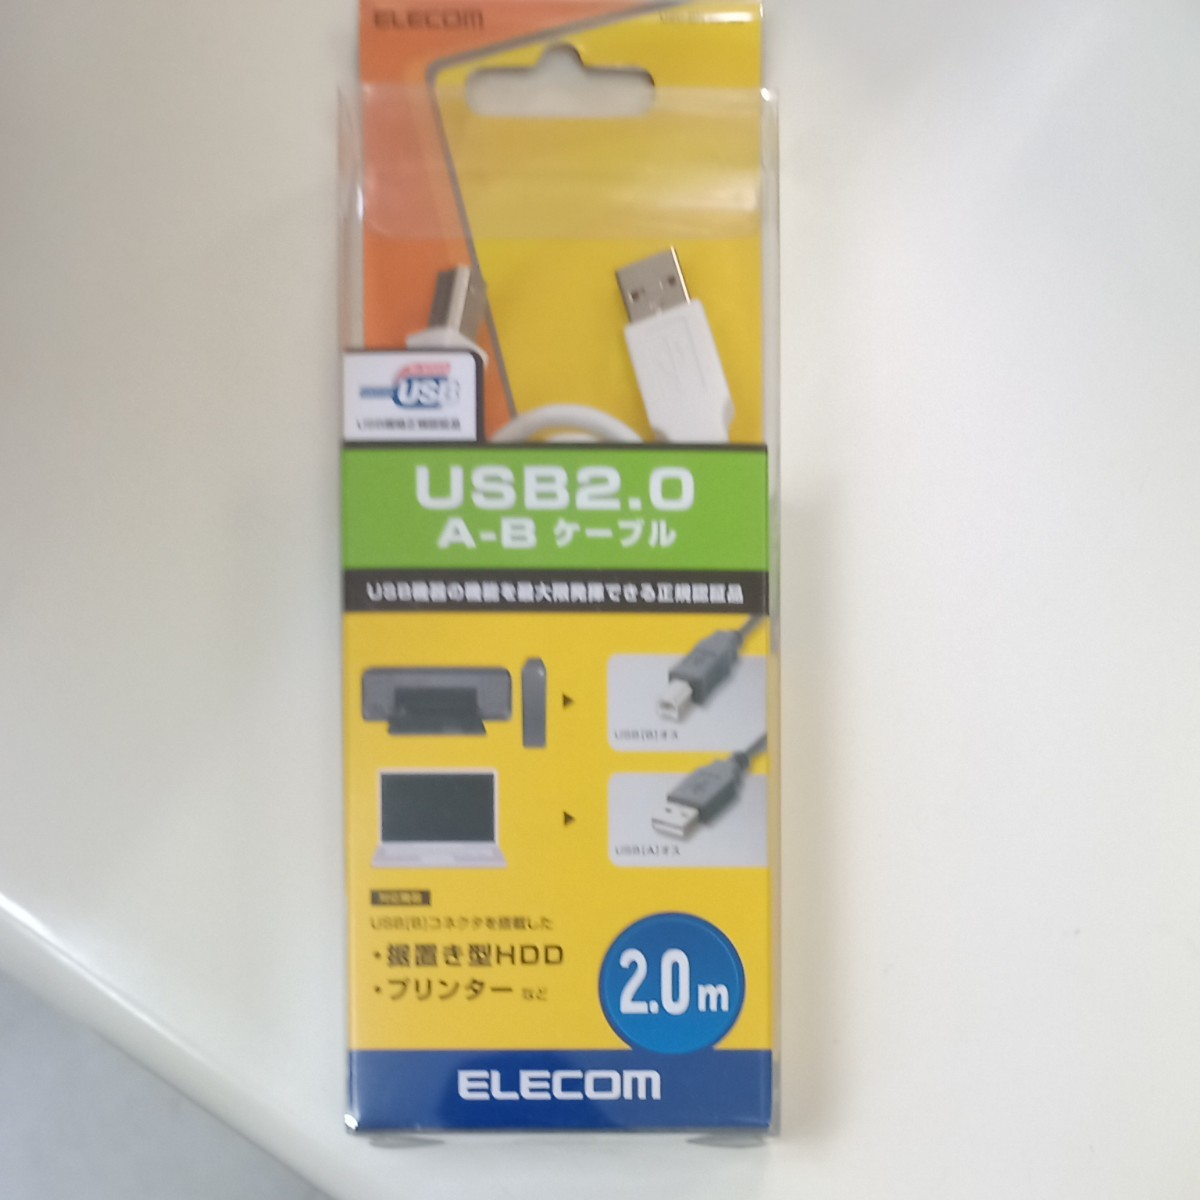 ELECOM  エレコム  USB2.0 USBケーブル 白 2m 新品未使用